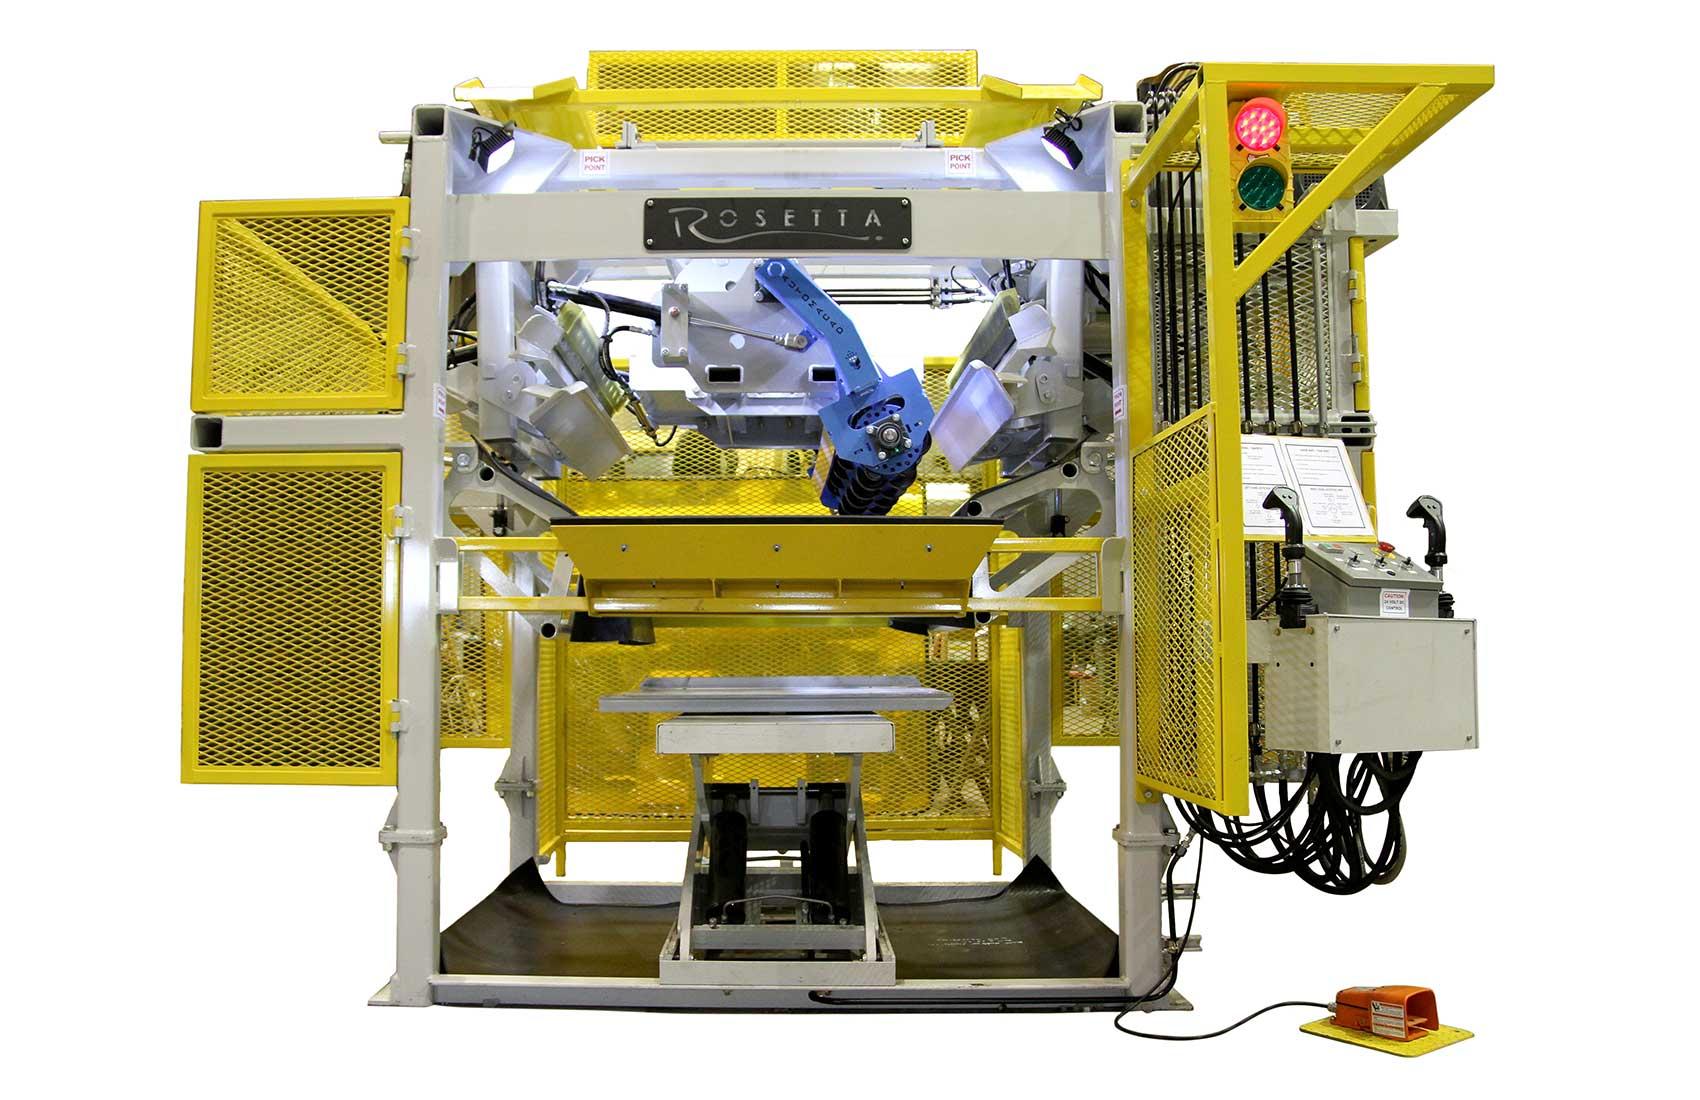 Rosetta equipment options